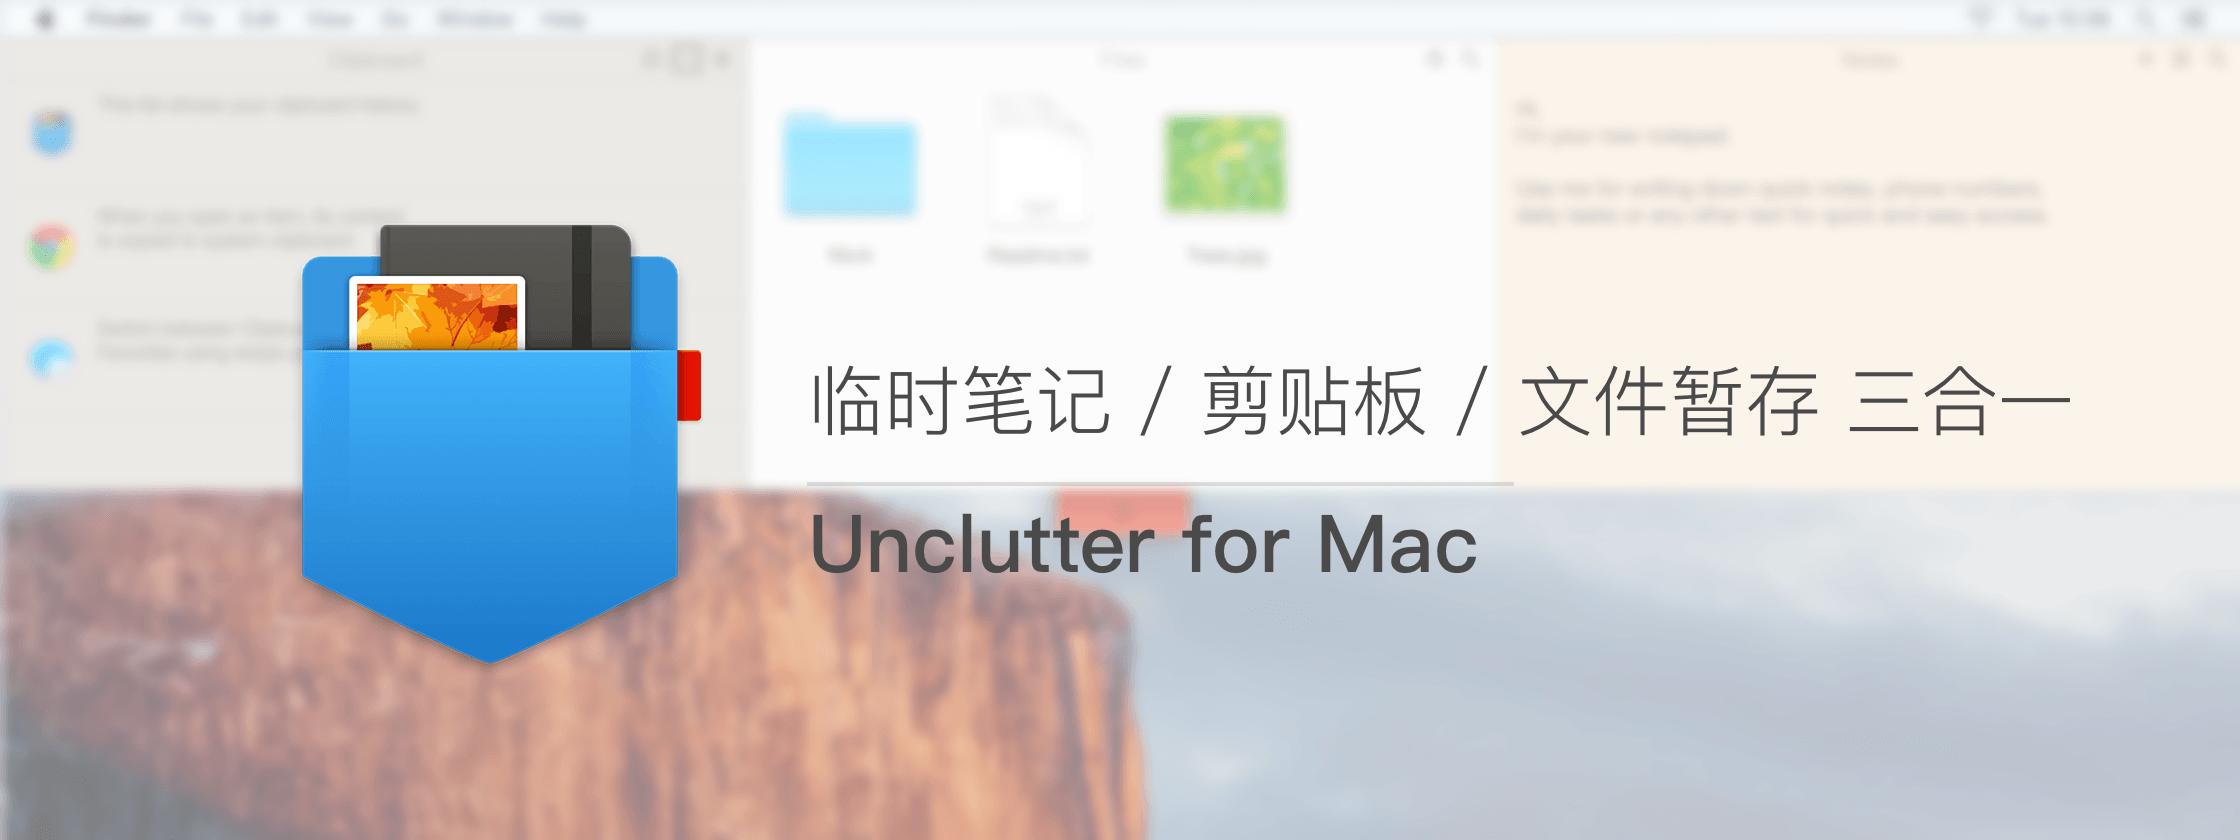 Unclutter,集成文件存储、剪贴板管理与笔记功能的轻量效率工具